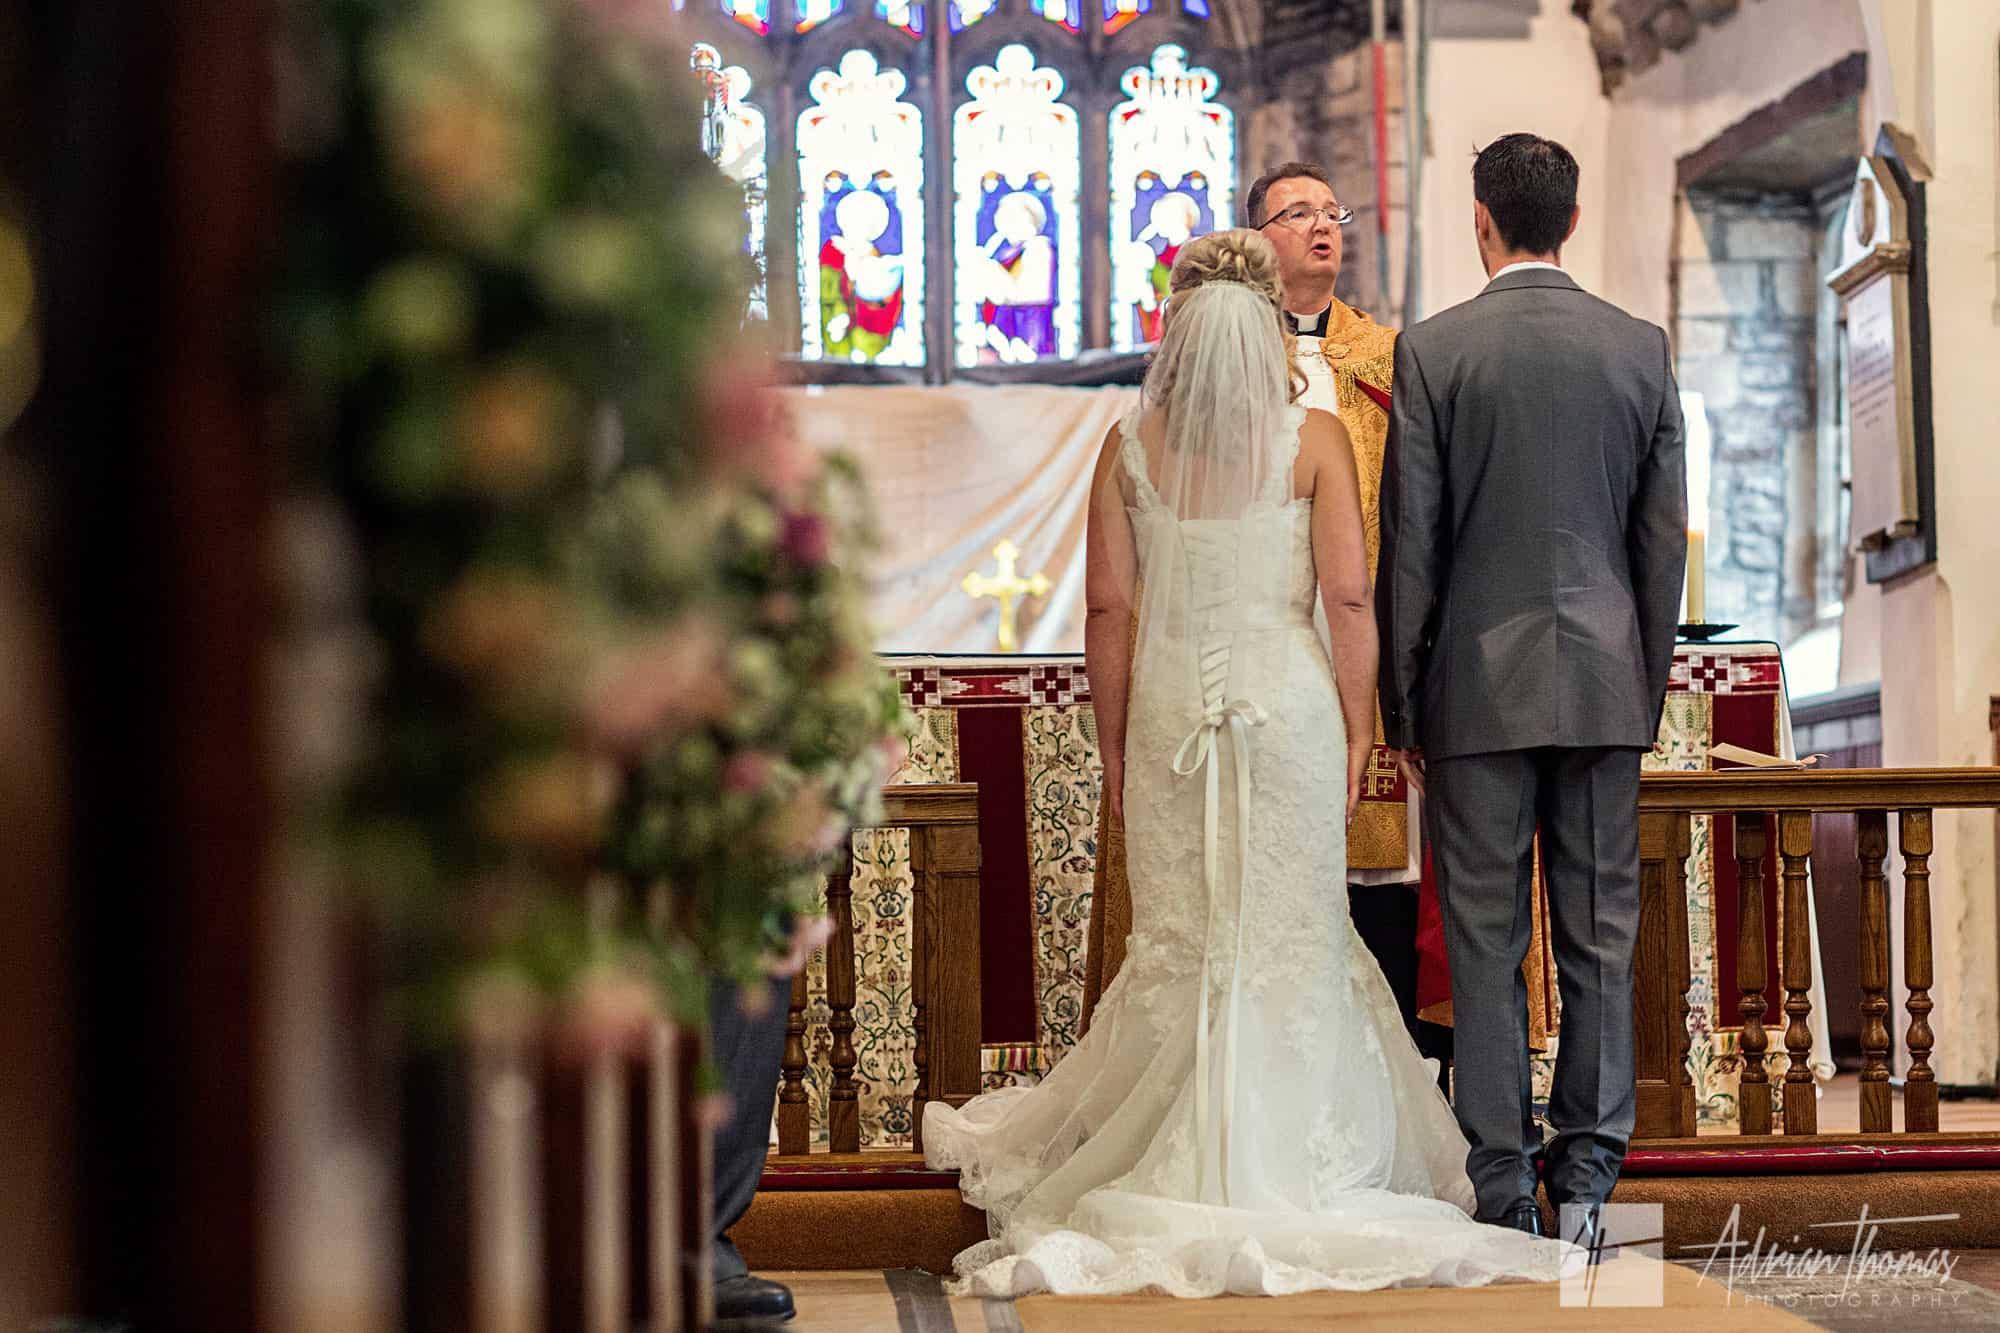 Photograph of wedding couple shot from isle.